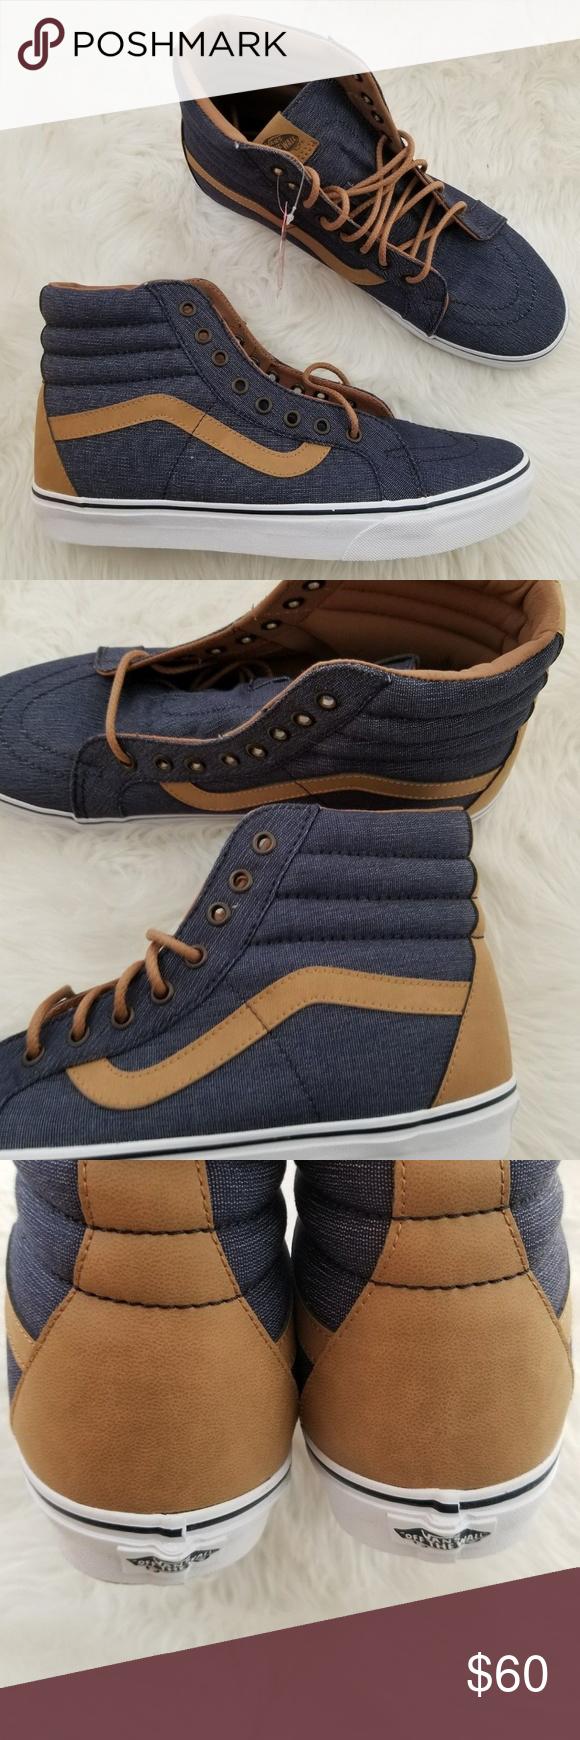 Vans SK8-Hi Reissue Denim Navy Blue M 11 NIB Brand new in box. Vans Sk8-Hi  Reissue Denim C L Navy Blue Shoes. Men s Size 11. Box may have some damage. 180968513